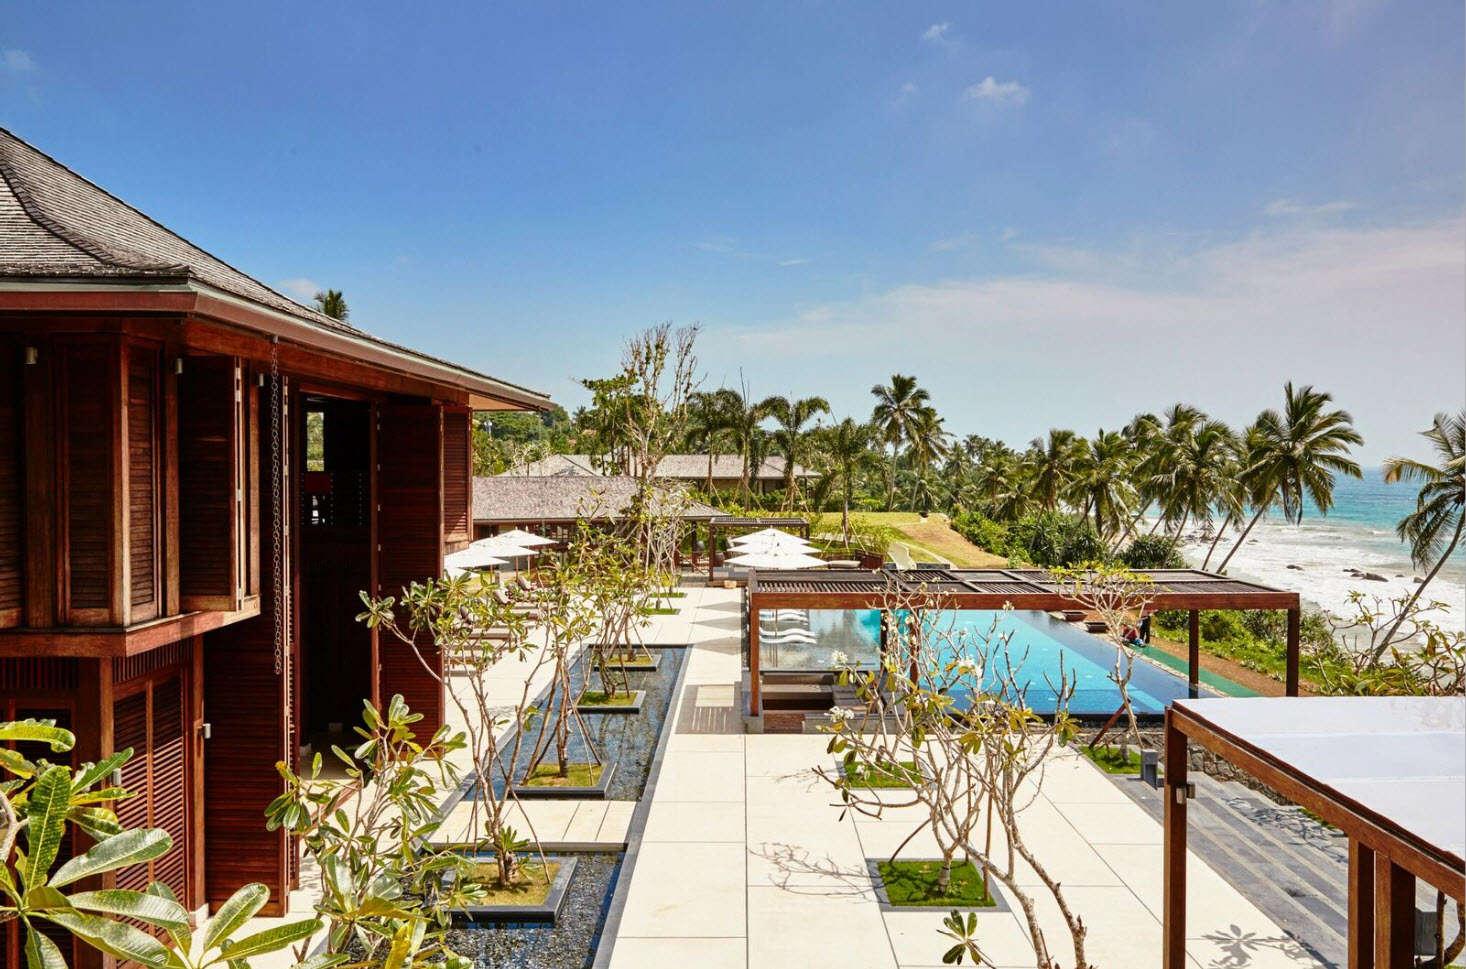 Luxury villa rentals asia - Sri lanka - Maliyadda - No location 4 - Ani Sri Lanka - Image 1/19